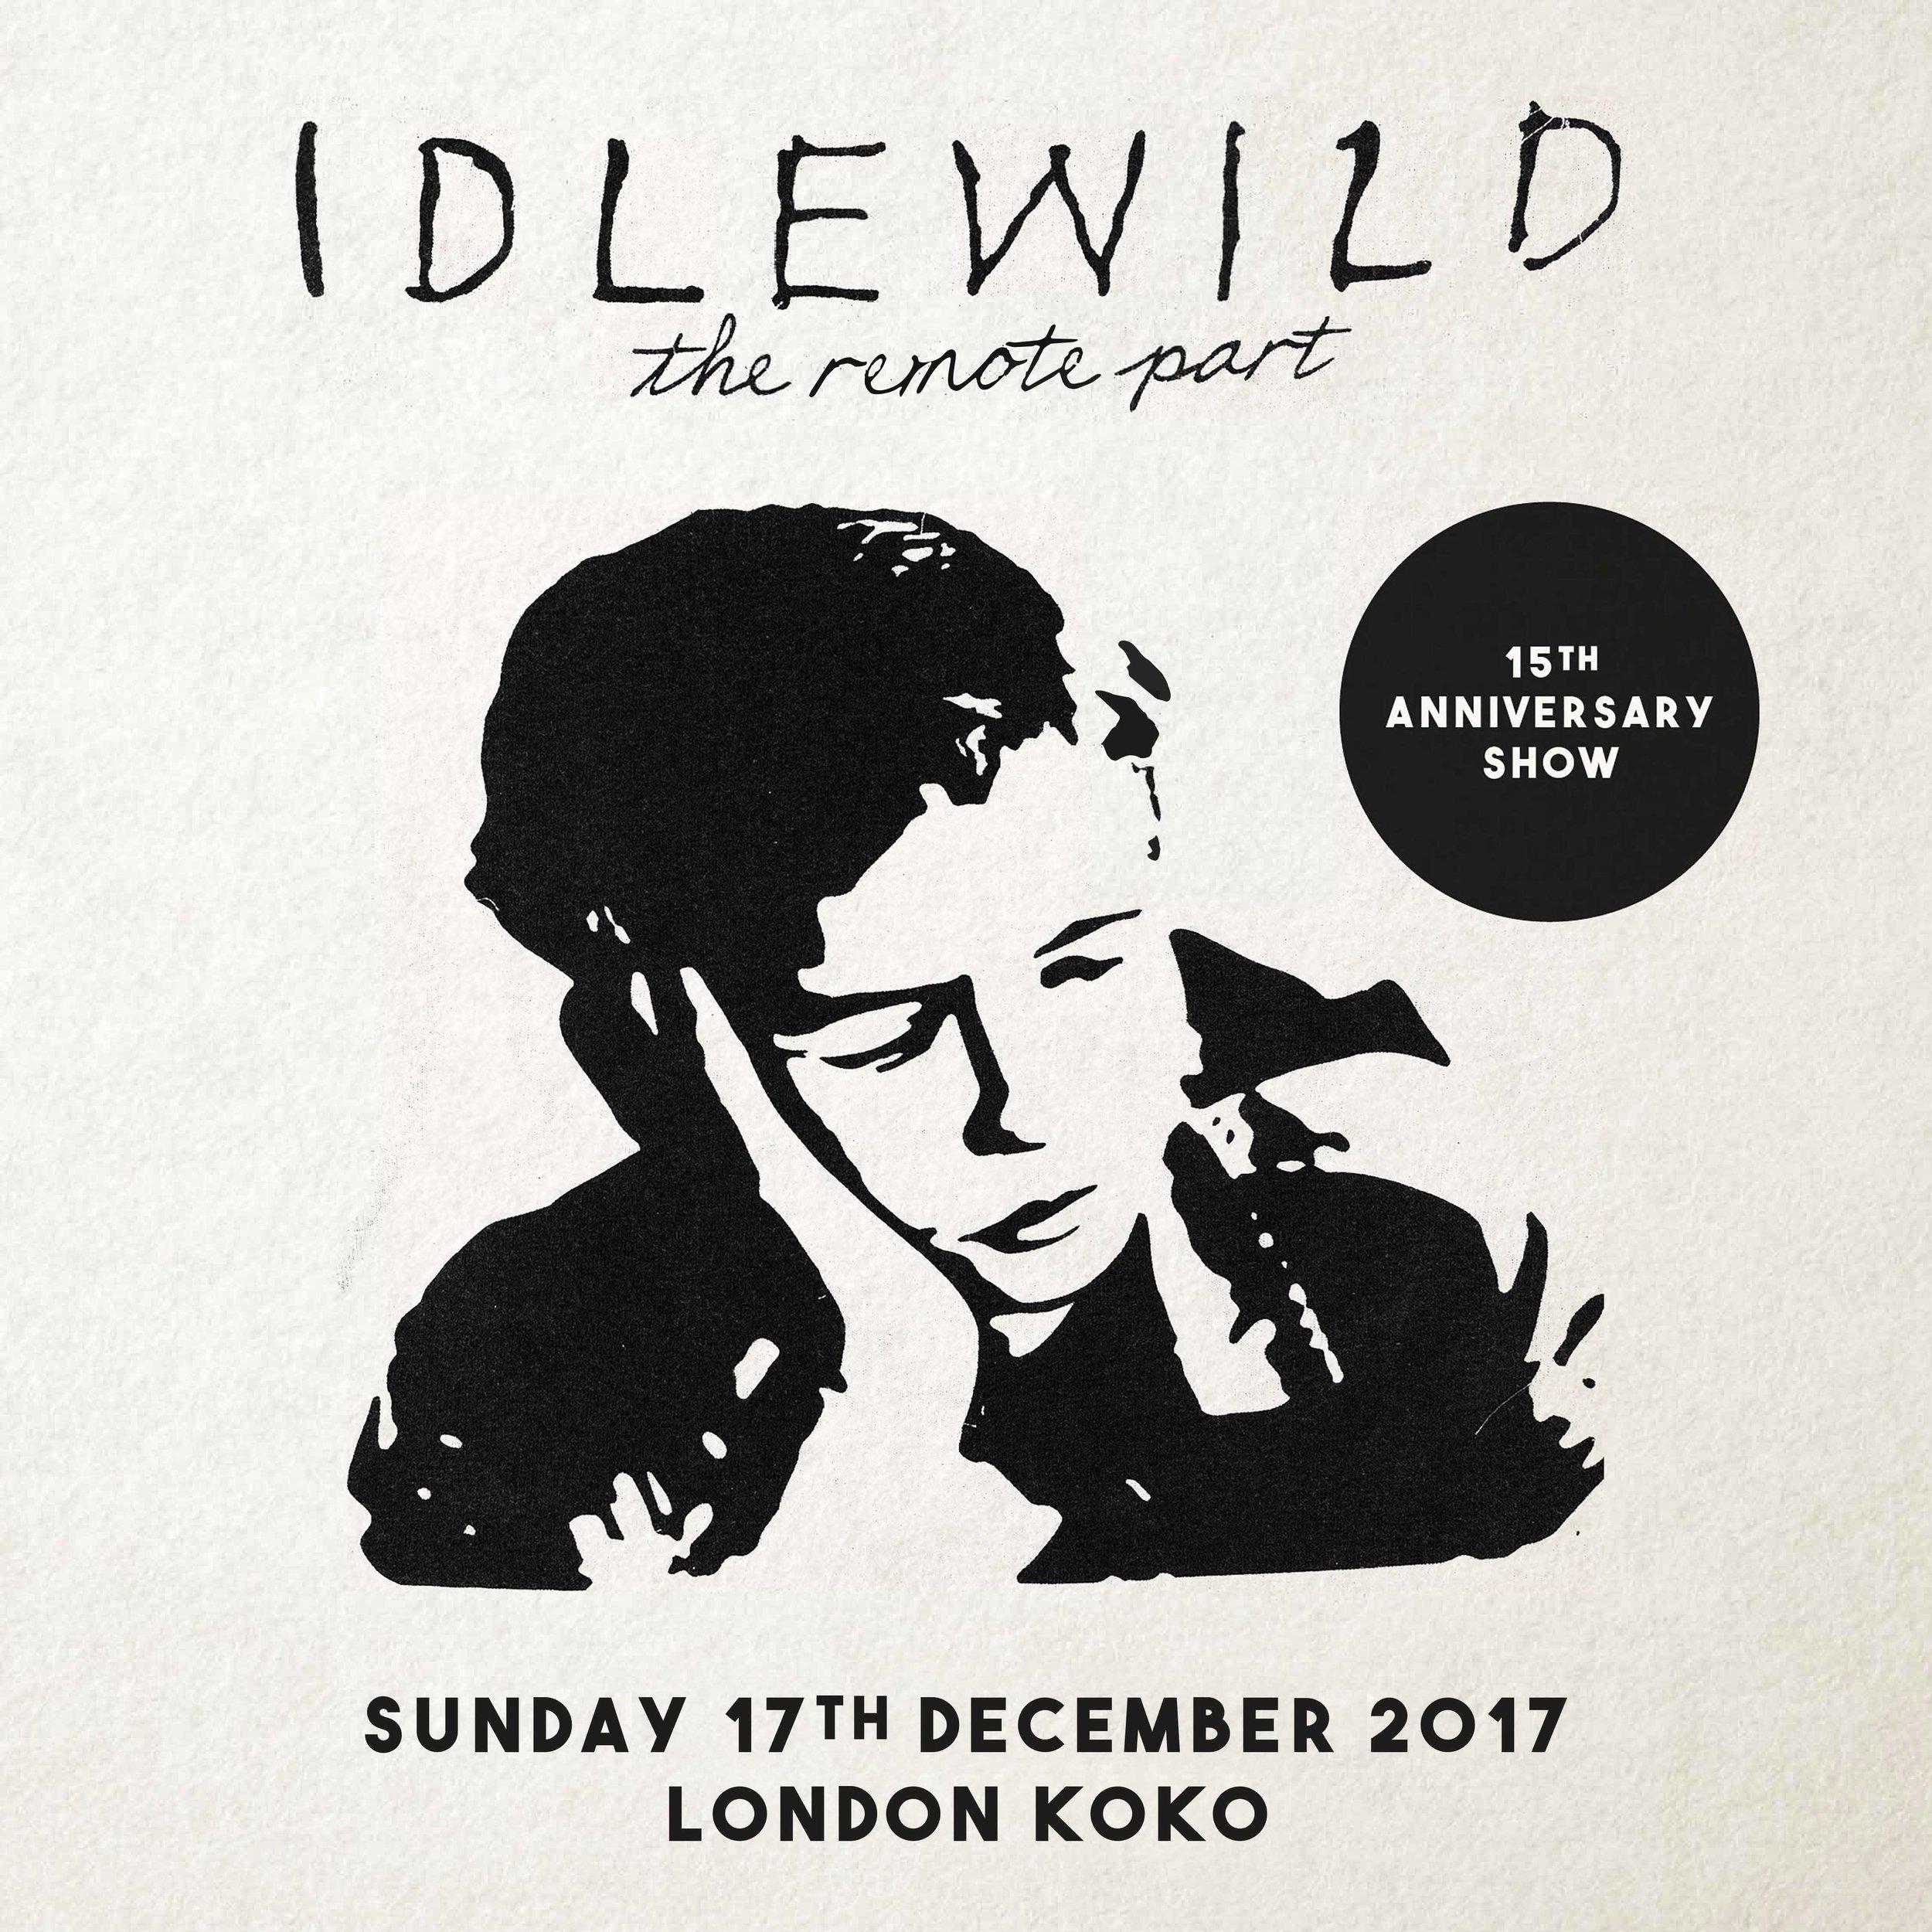 IDLEWILD_Remote Part Show_LONDON_Social_30.10.17.jpg